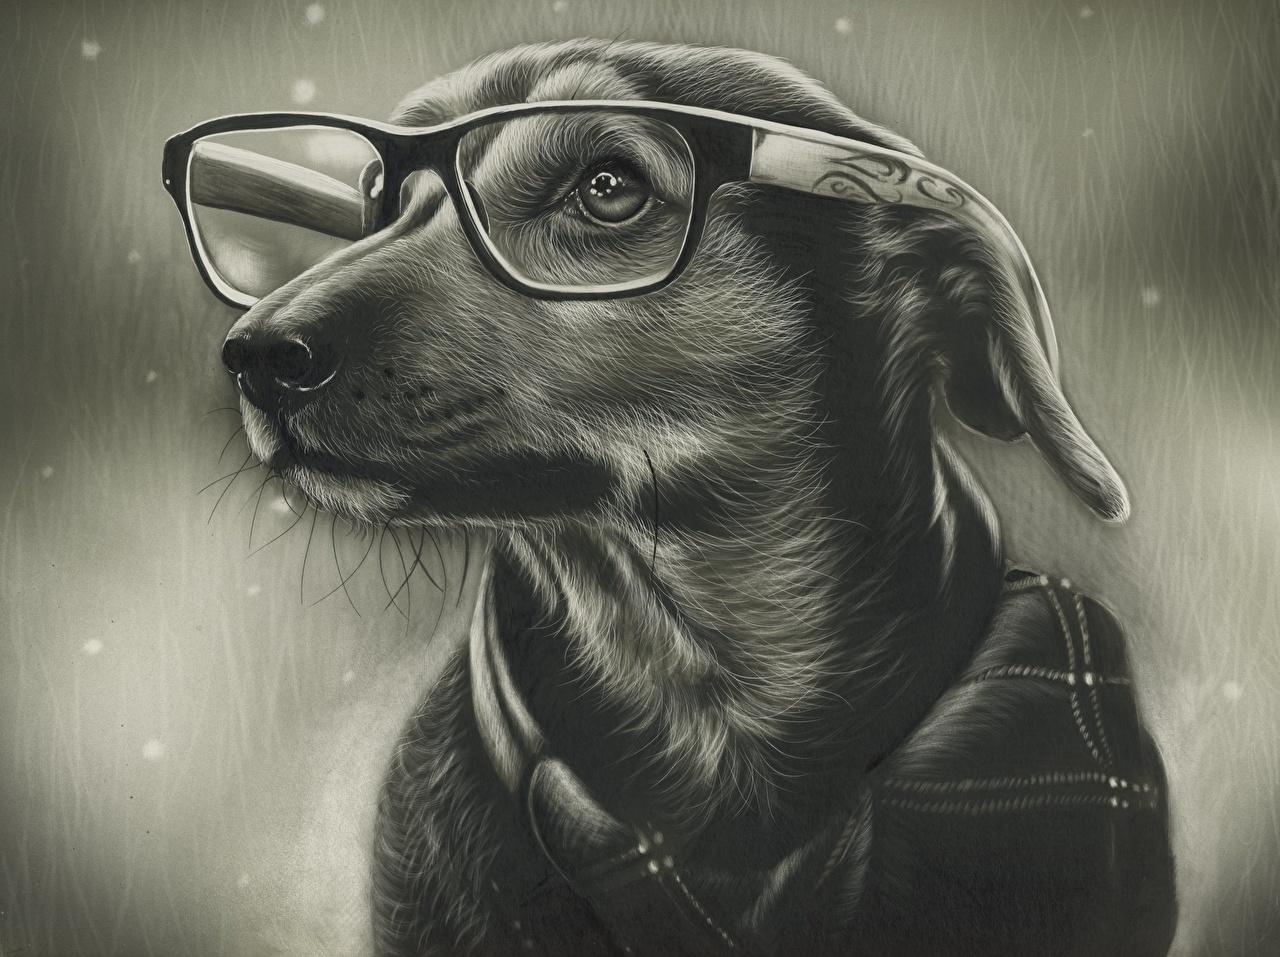 Wallpaper Dogs eyeglasses Black and white Animals Painting Art dog Glasses animal